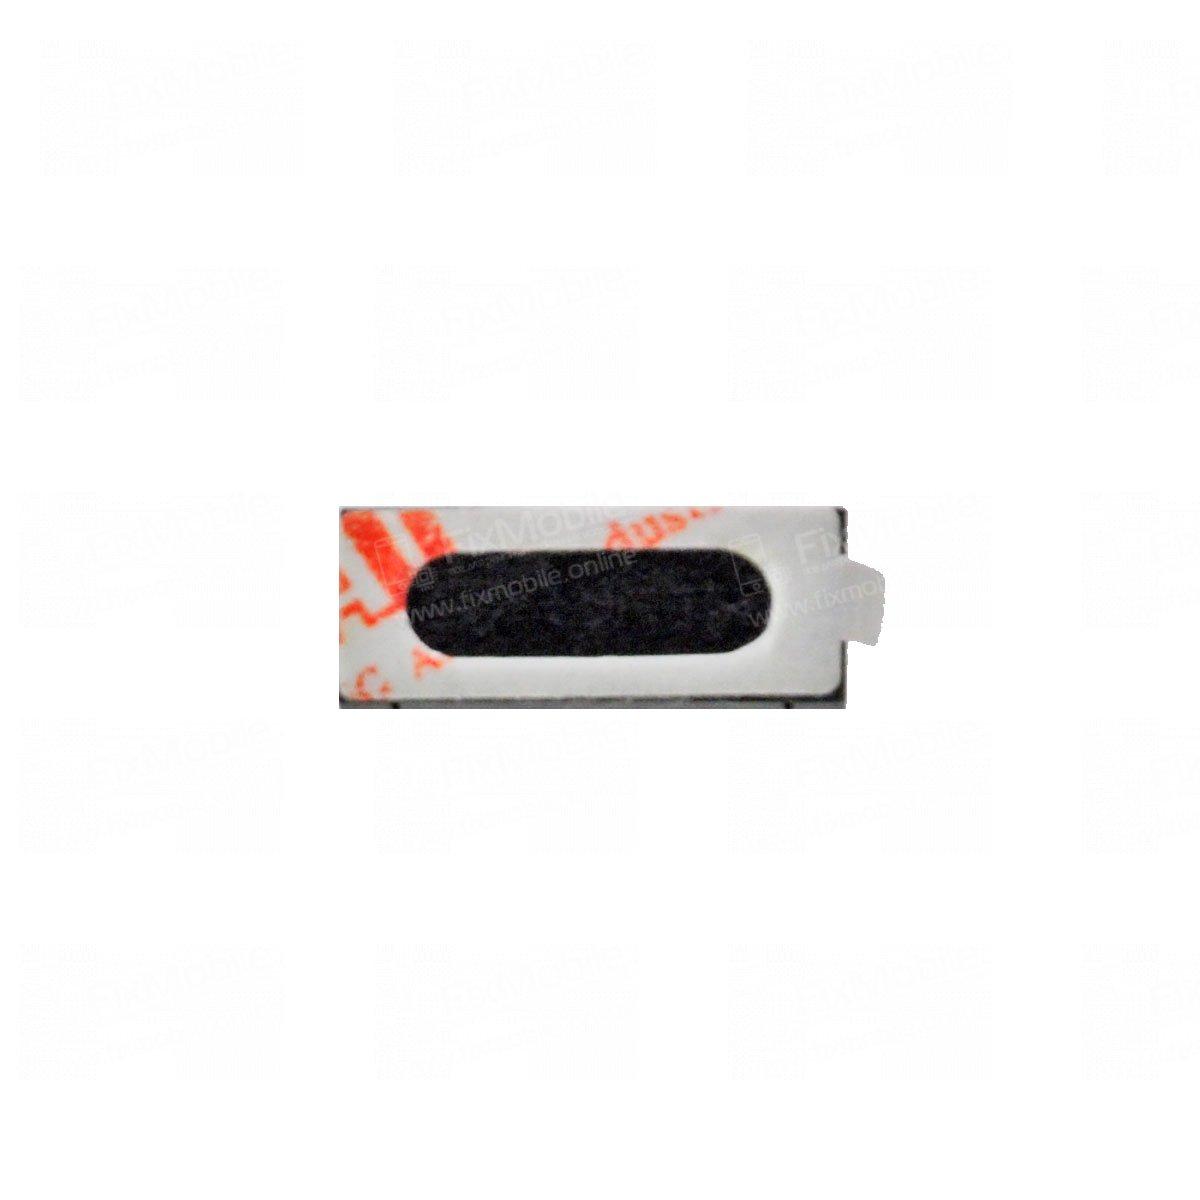 Динамик (speaker) для Oysters T72M 3G